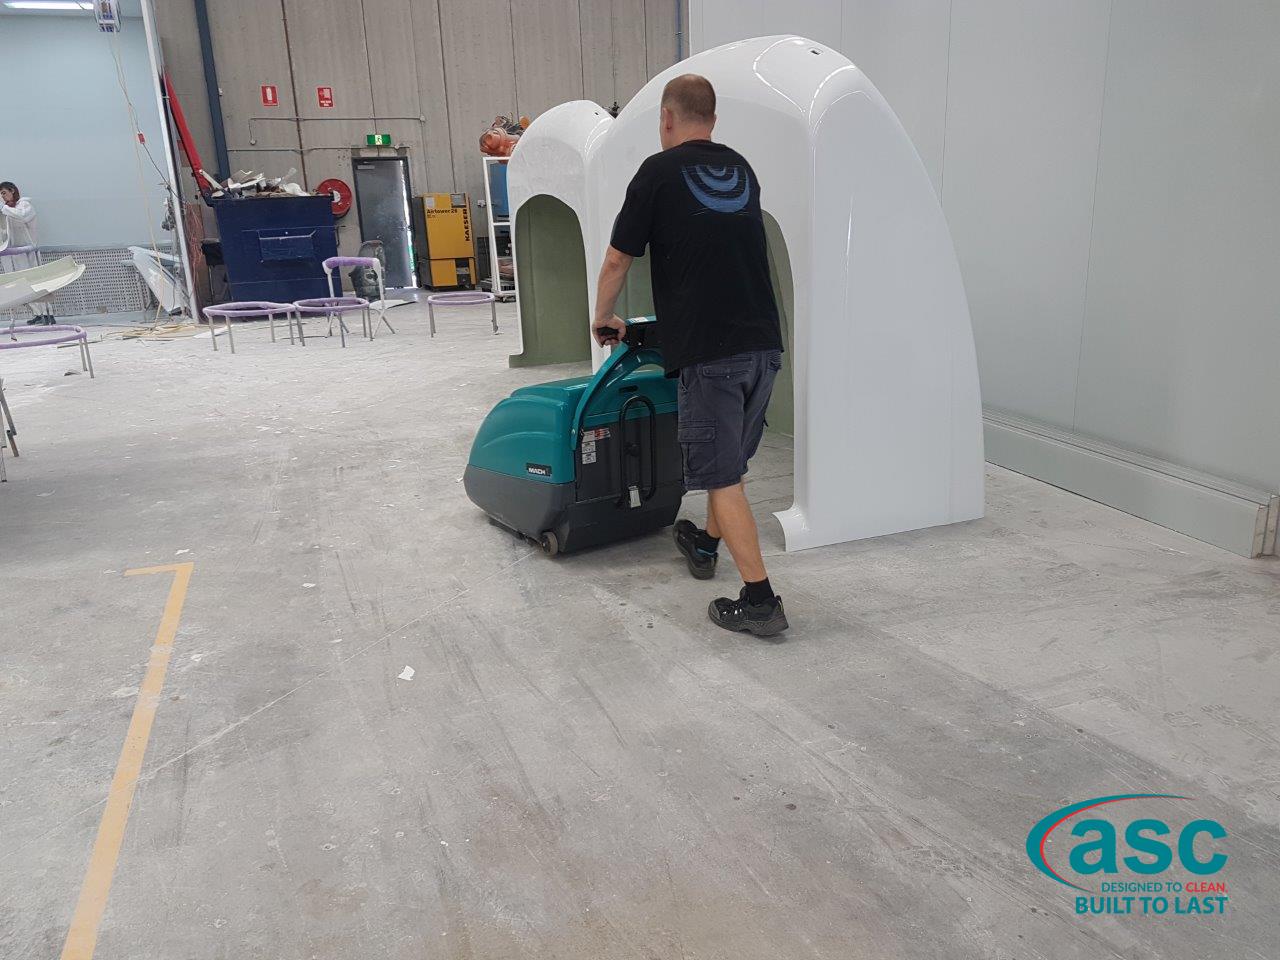 Picton Hopkins Facility Using ASC Eureka M1 Sweeper 2